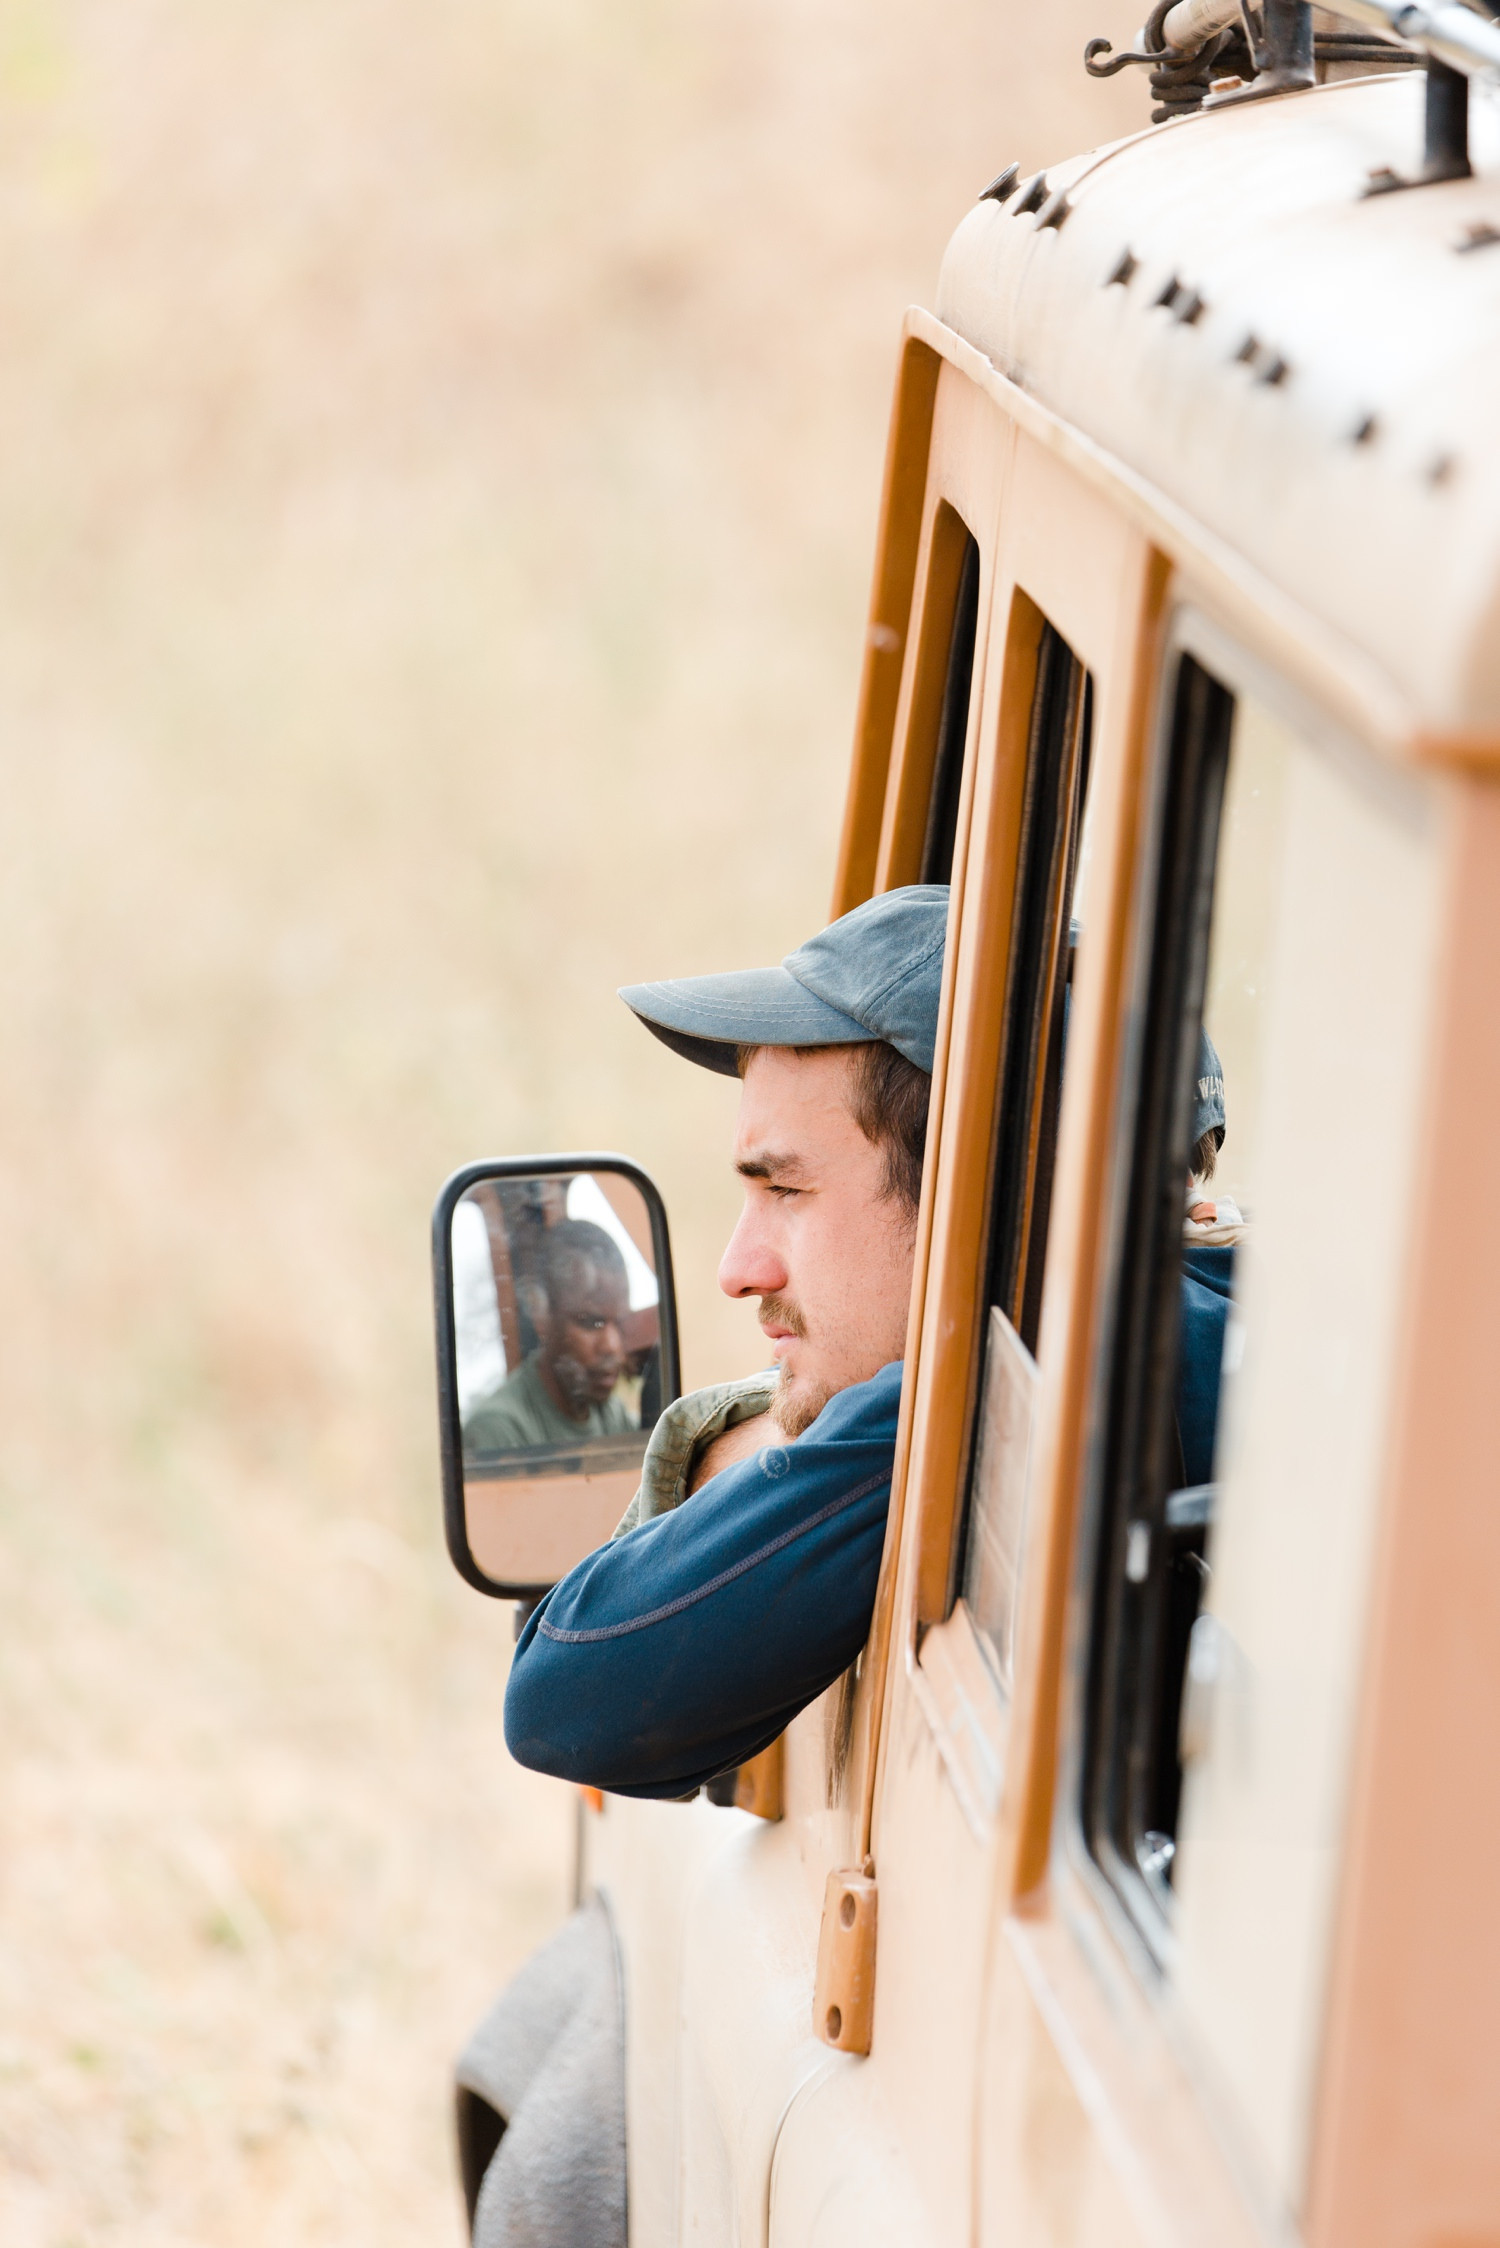 cameron-zegers-travel-photographer-tanzania-safari-expedition.jpg